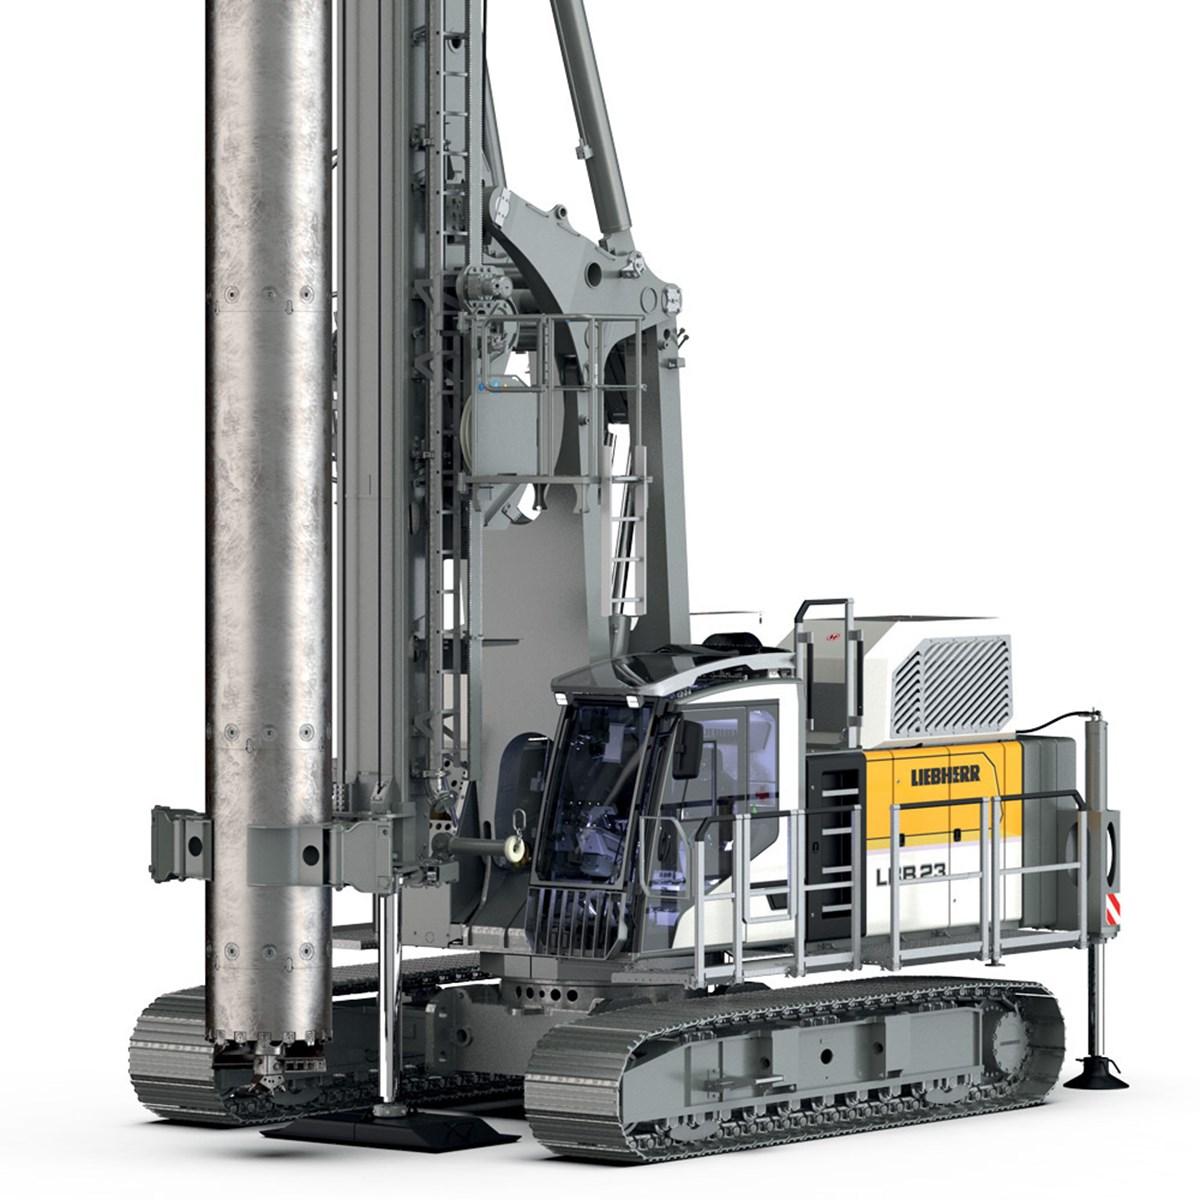 liebherr-lrb-23-piling-and-drilling-rig-ramm-und-bohrgeraet-dba-titel-new-de-1.jpg